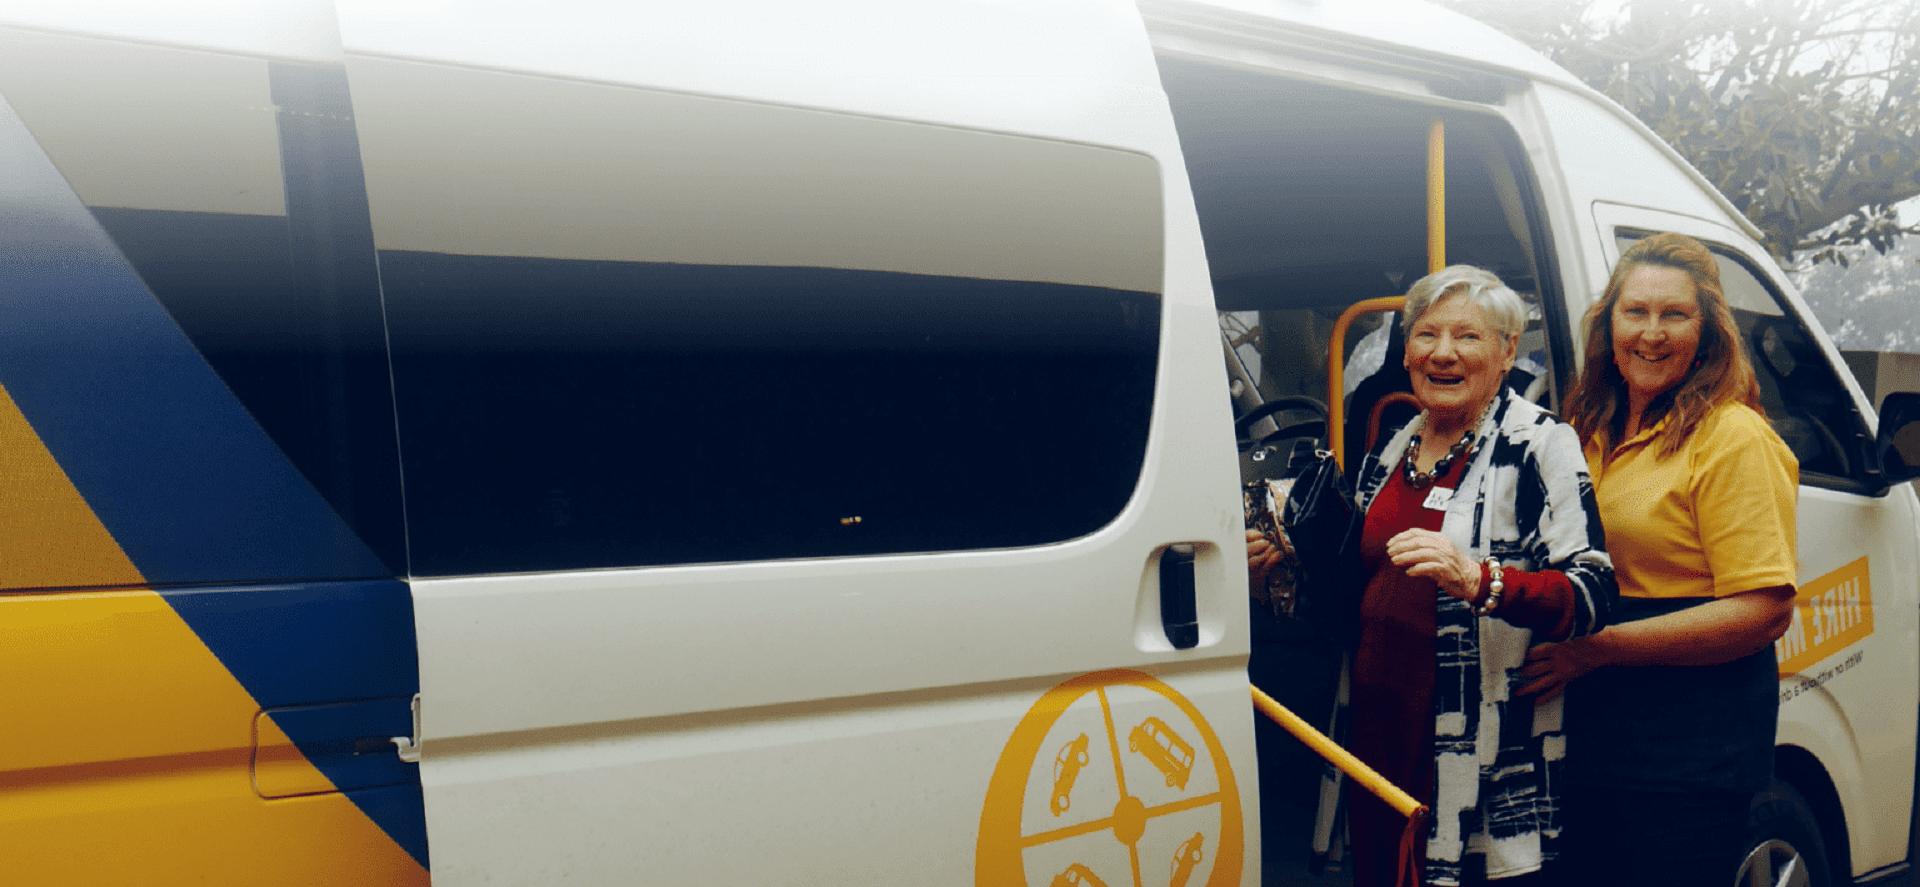 community-transport-bus